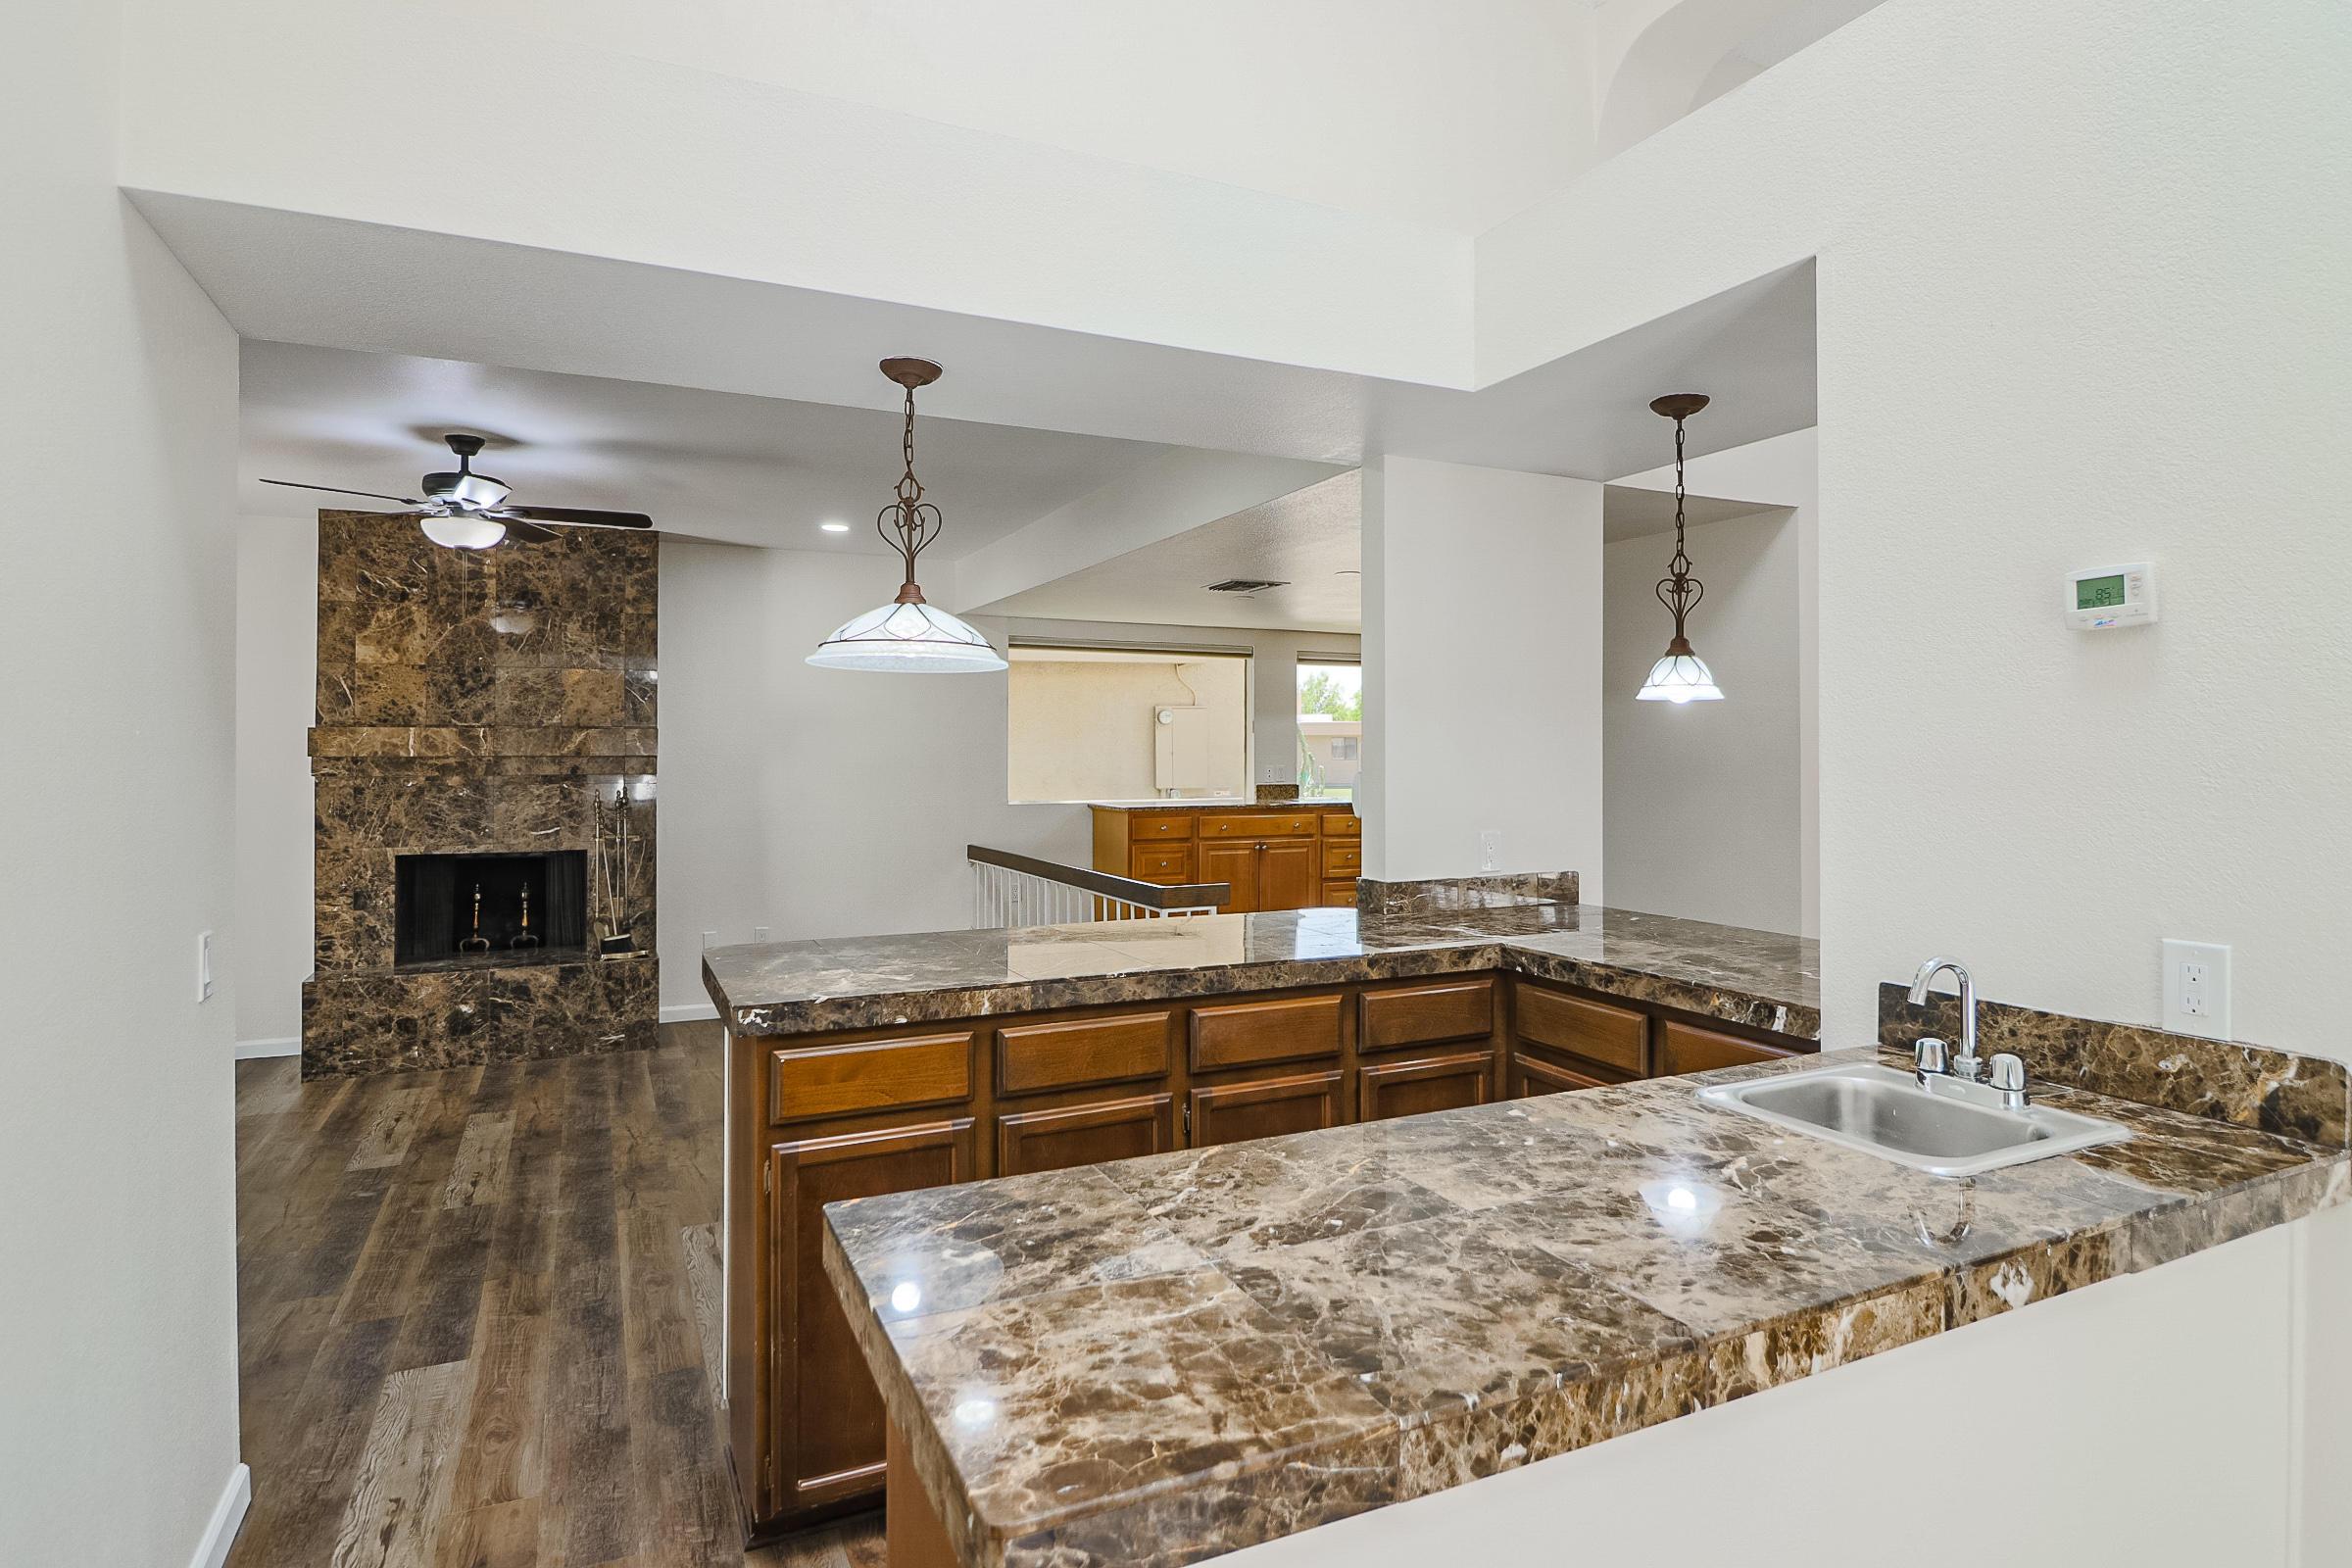 8185 DEL MARINO Drive, Scottsdale, Arizona 85258, 3 Bedrooms Bedrooms, ,3 BathroomsBathrooms,Residential,For Sale,DEL MARINO,6236110